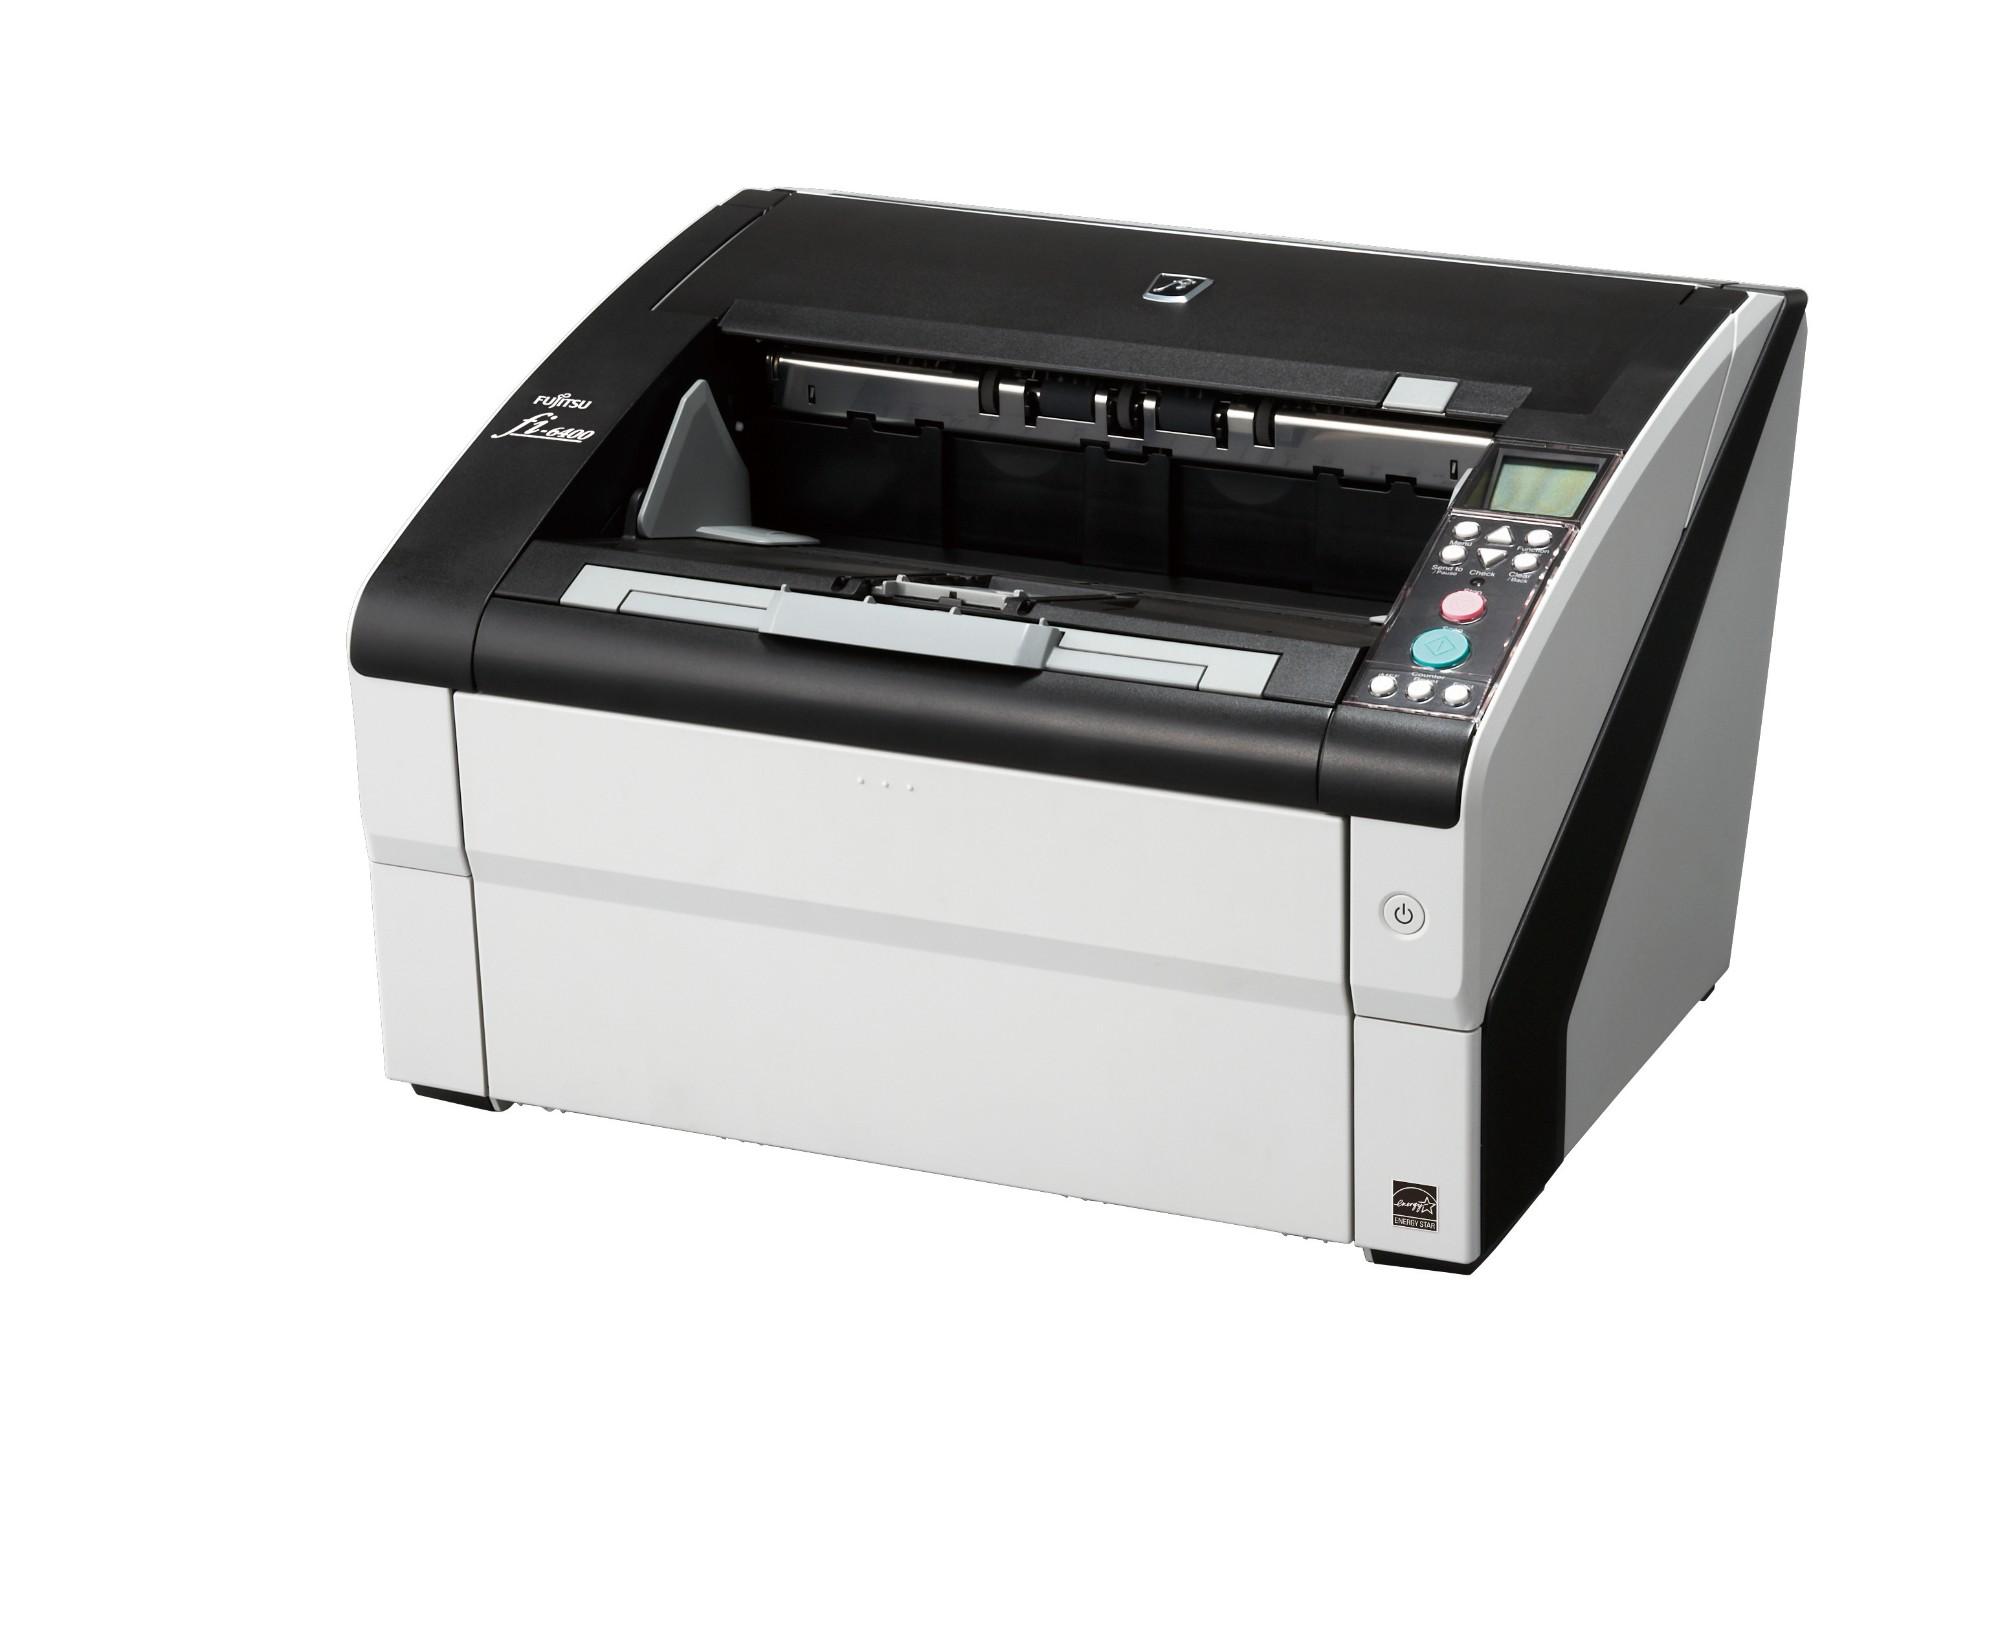 Fujitsu fi-6400 ADF + Manual feed 600 x 600DPI A3 Black,White